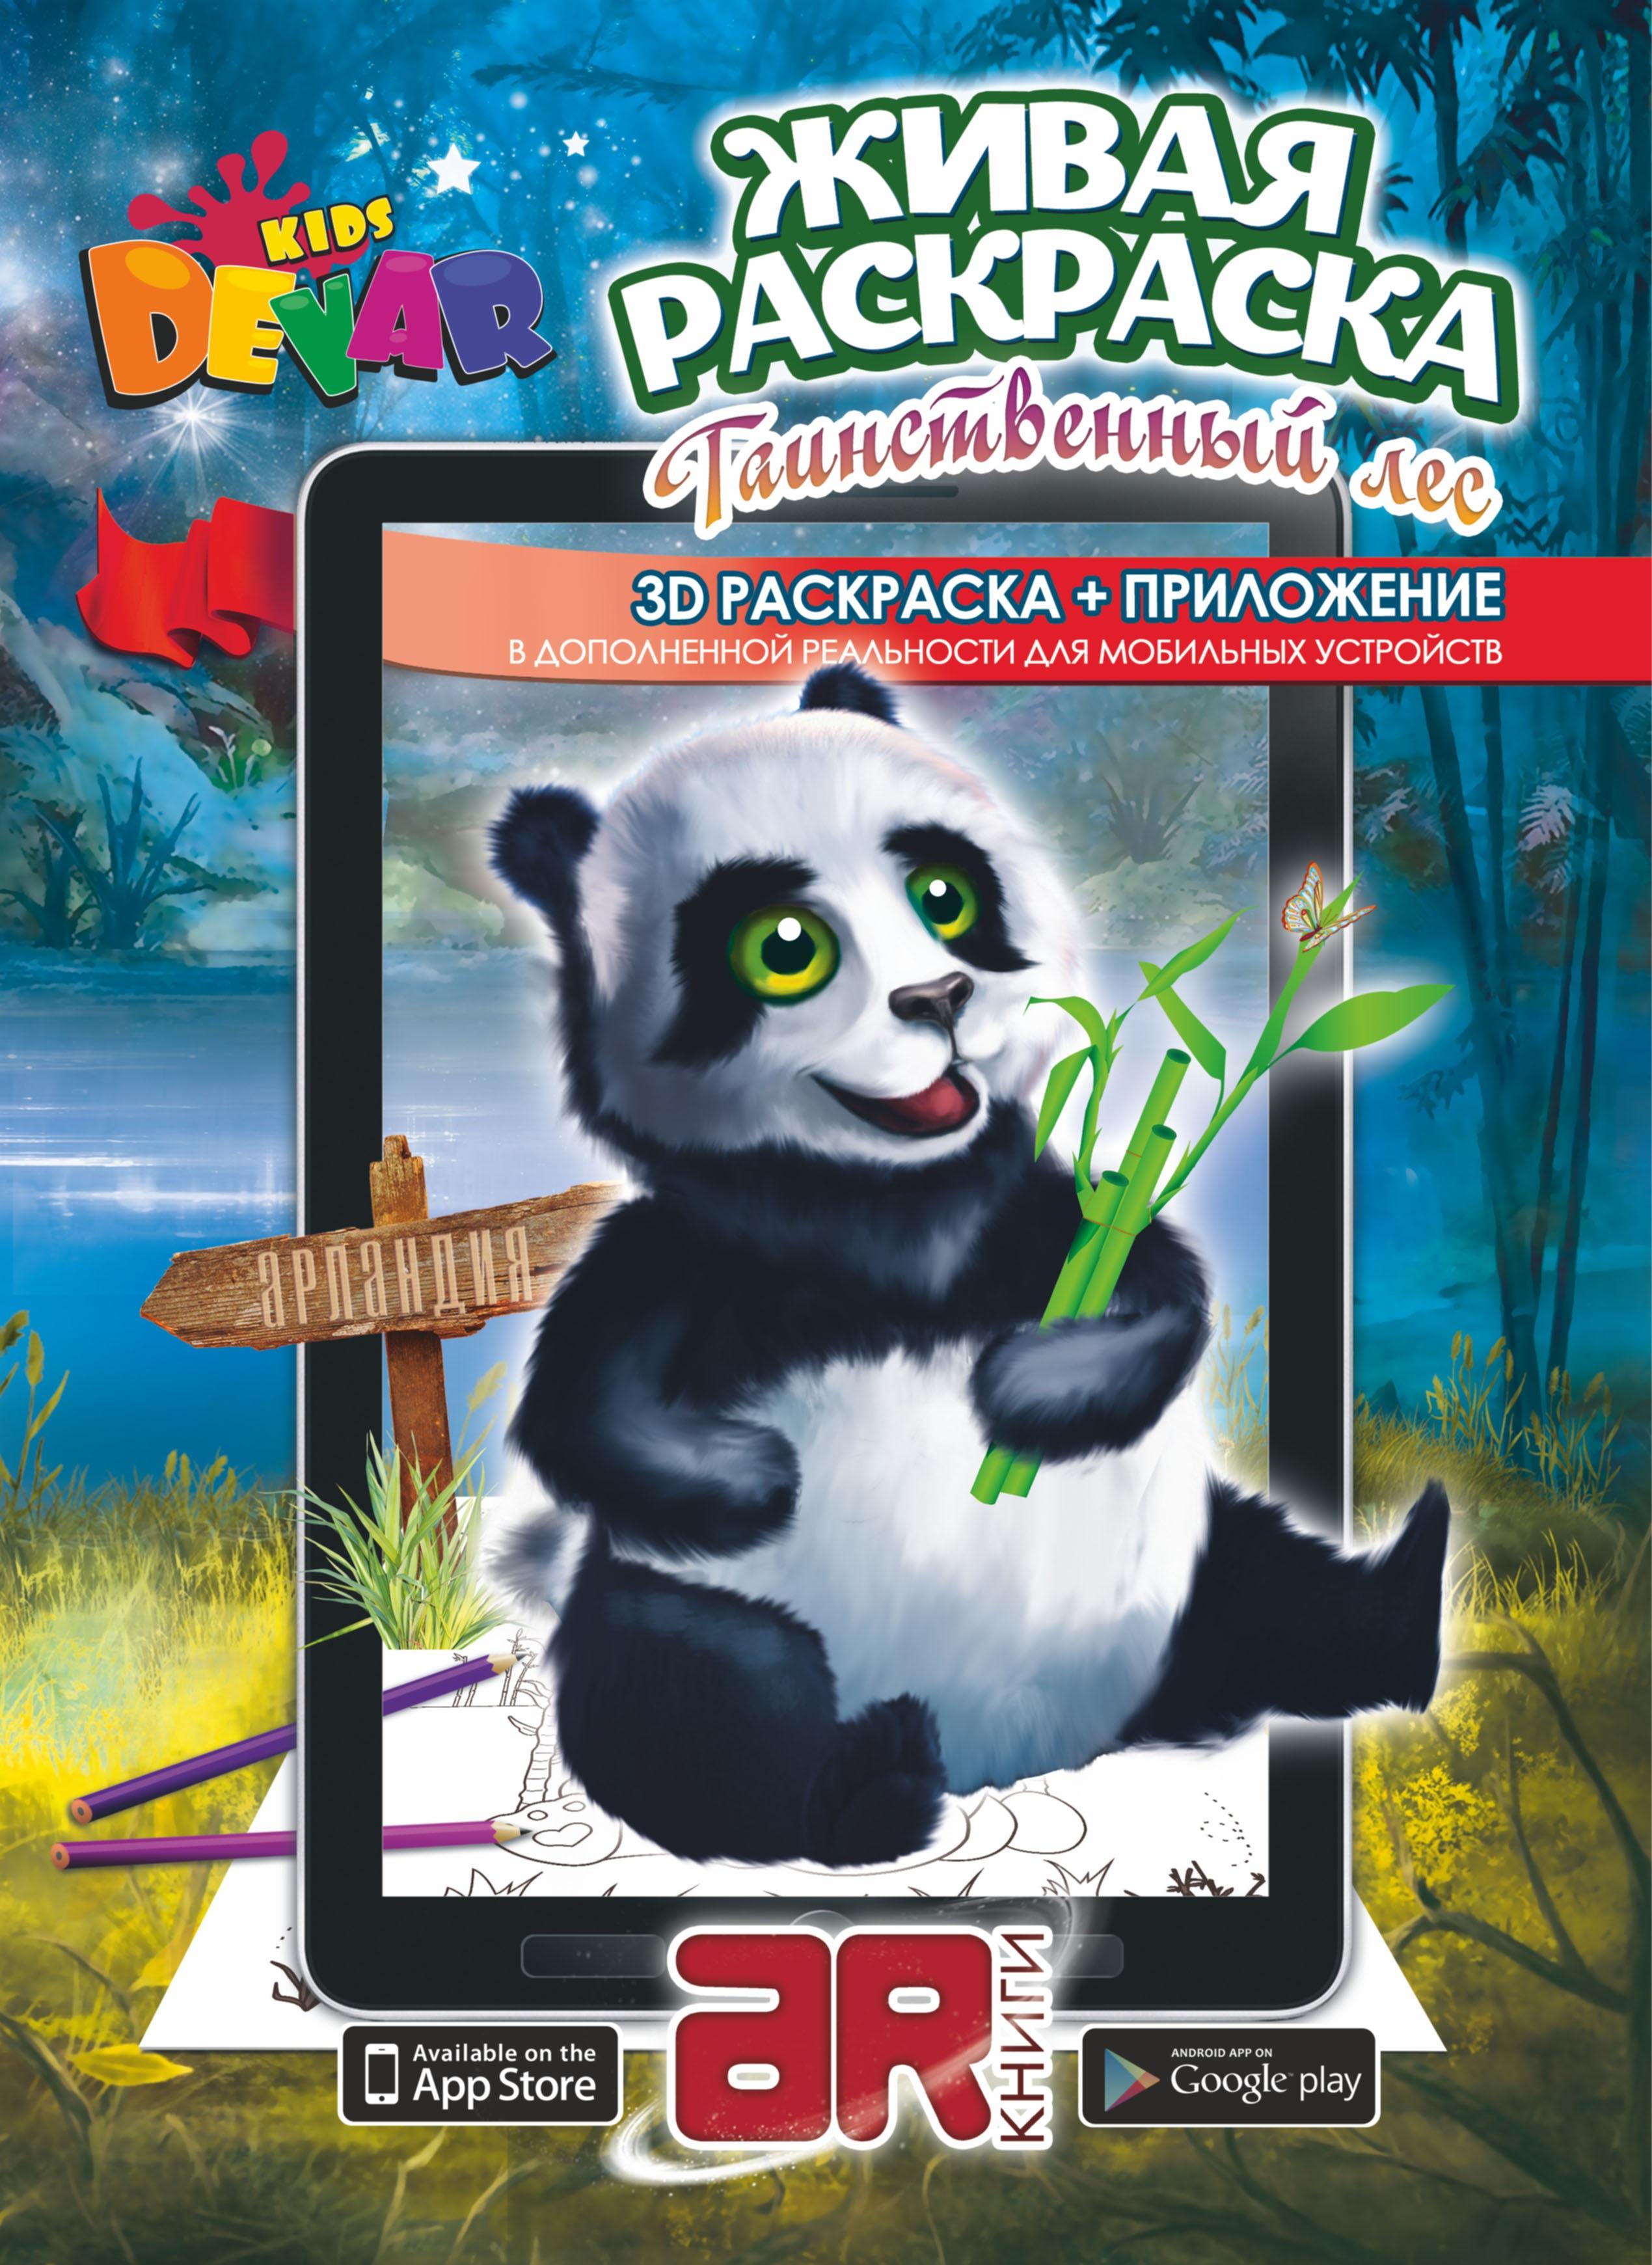 Раскраска«Таинственный лес»А4, мягкая обложка раскраски devar сказка раскраска лиса и журавль а4 мягкая обложка